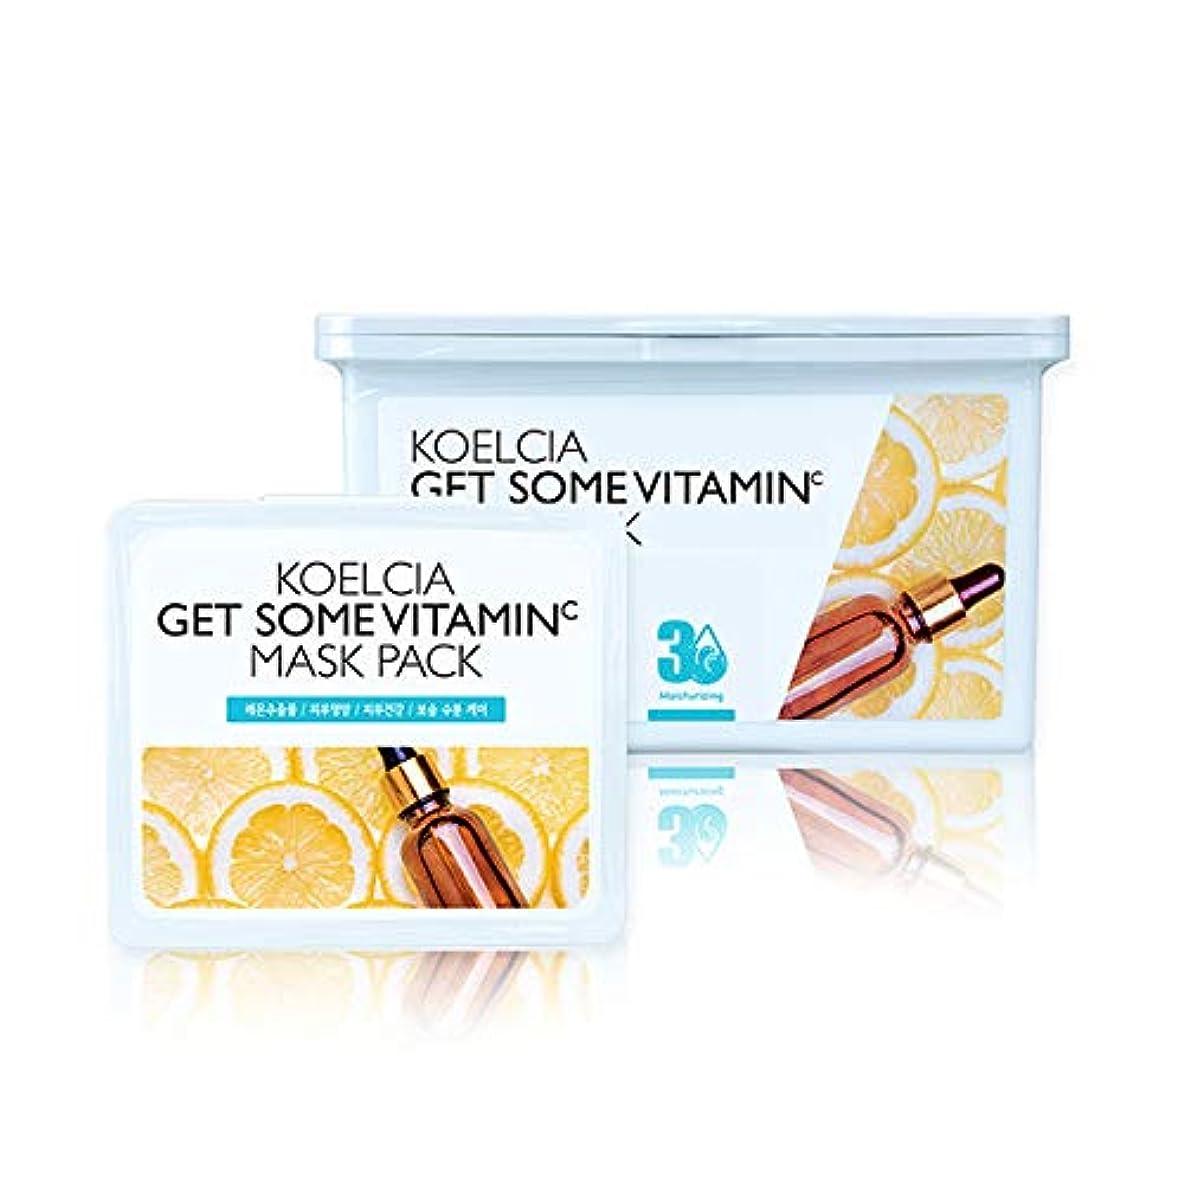 KOELCIA Get Some Vitamin C Mask Pack 30Pcs マスクパック/大容量(1日1Pack 30日分) [並行輸入品]